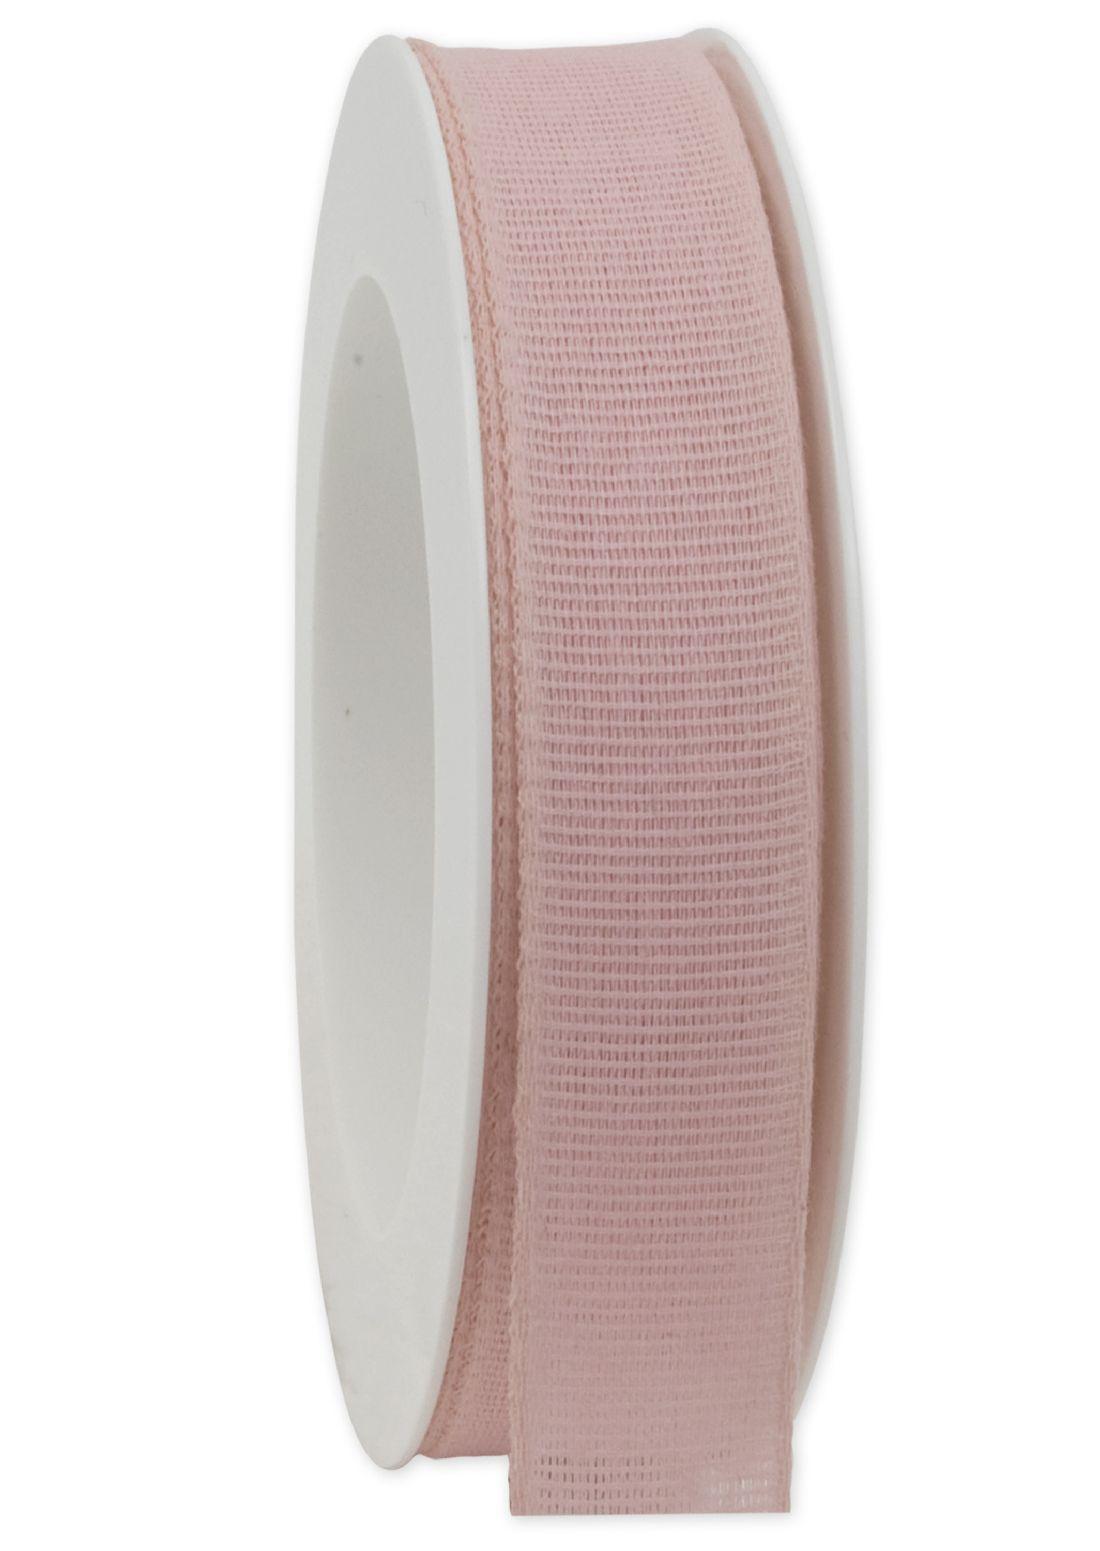 Basicband NATURE rosa 21 biologisch abbaubar B:25mm L:20m Baumwollband 267